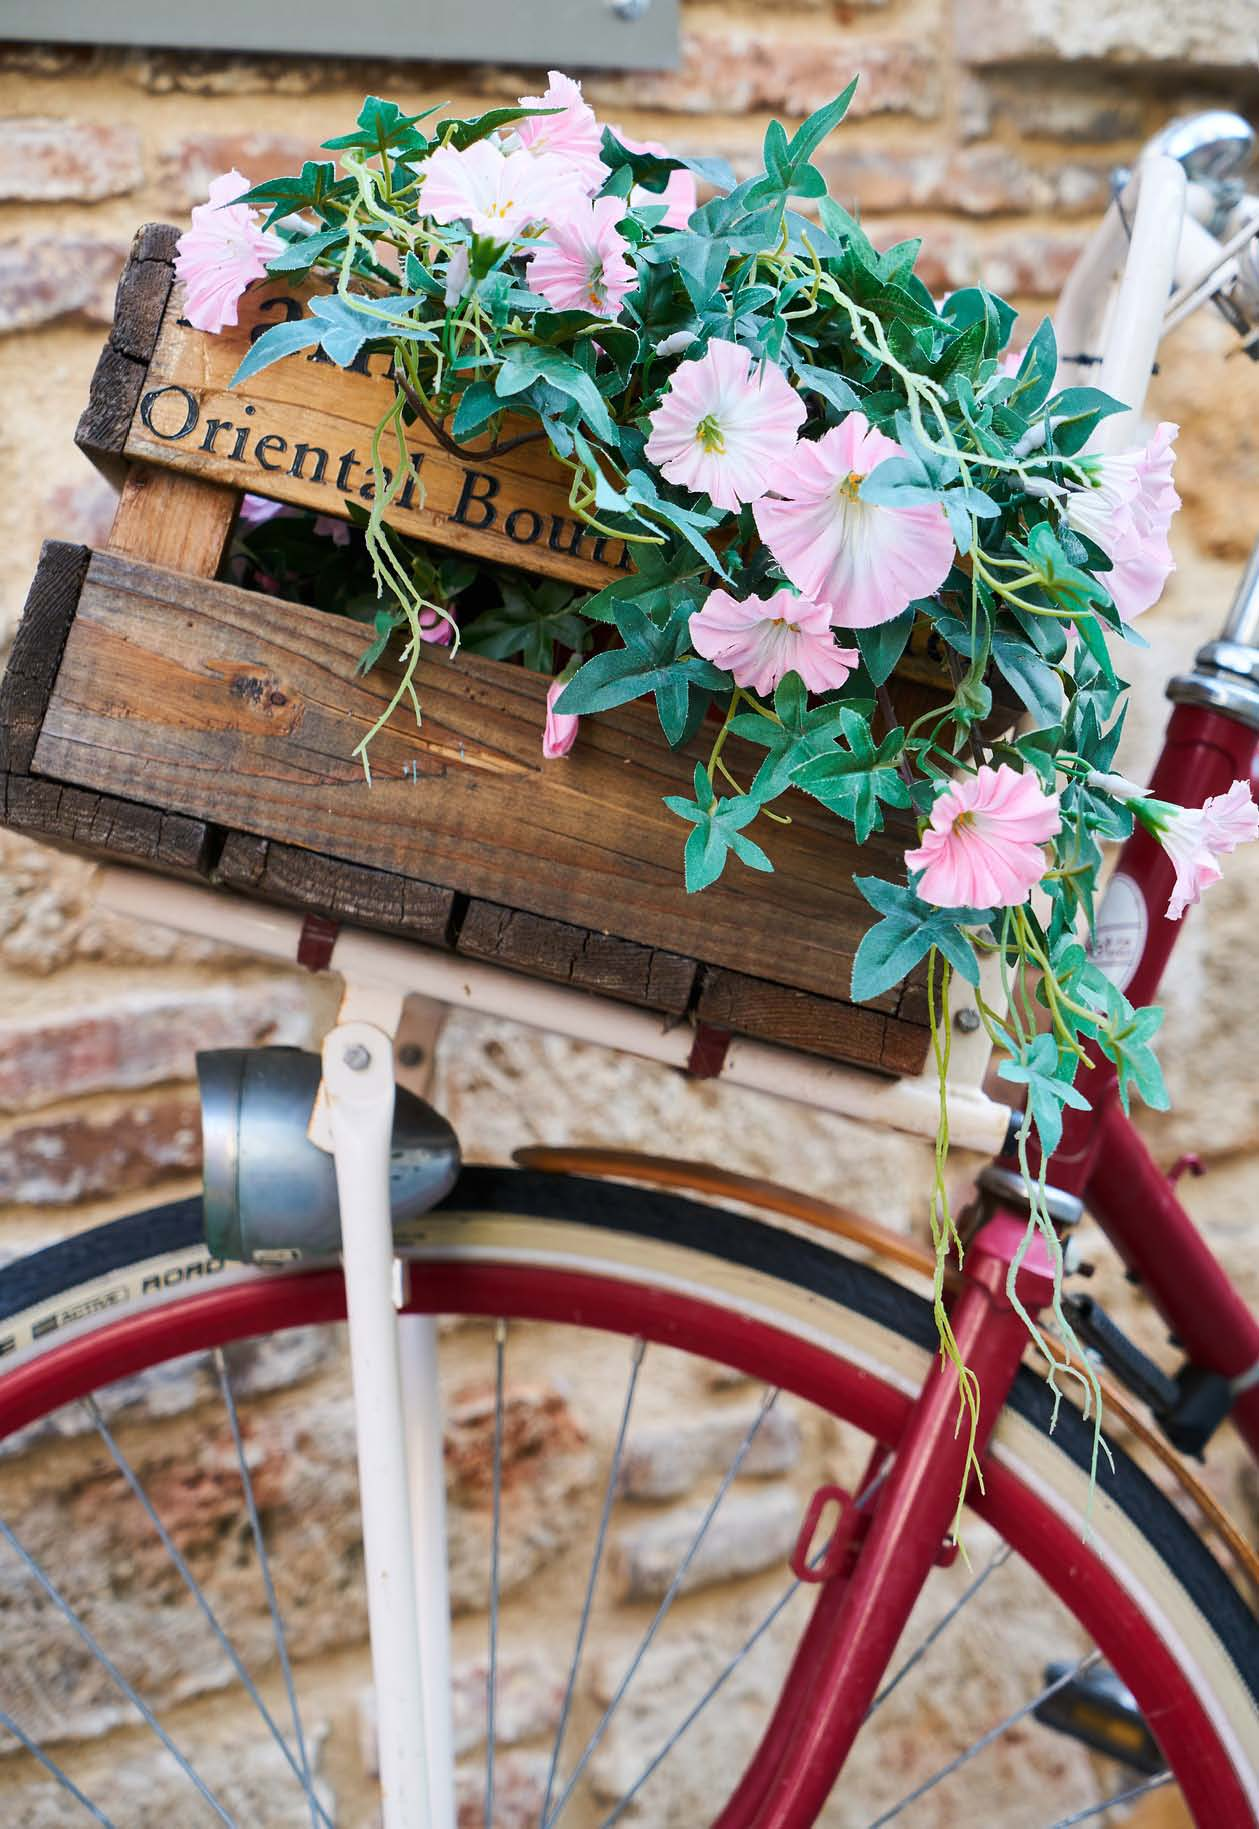 CB-bicyclette-polyester-sefam